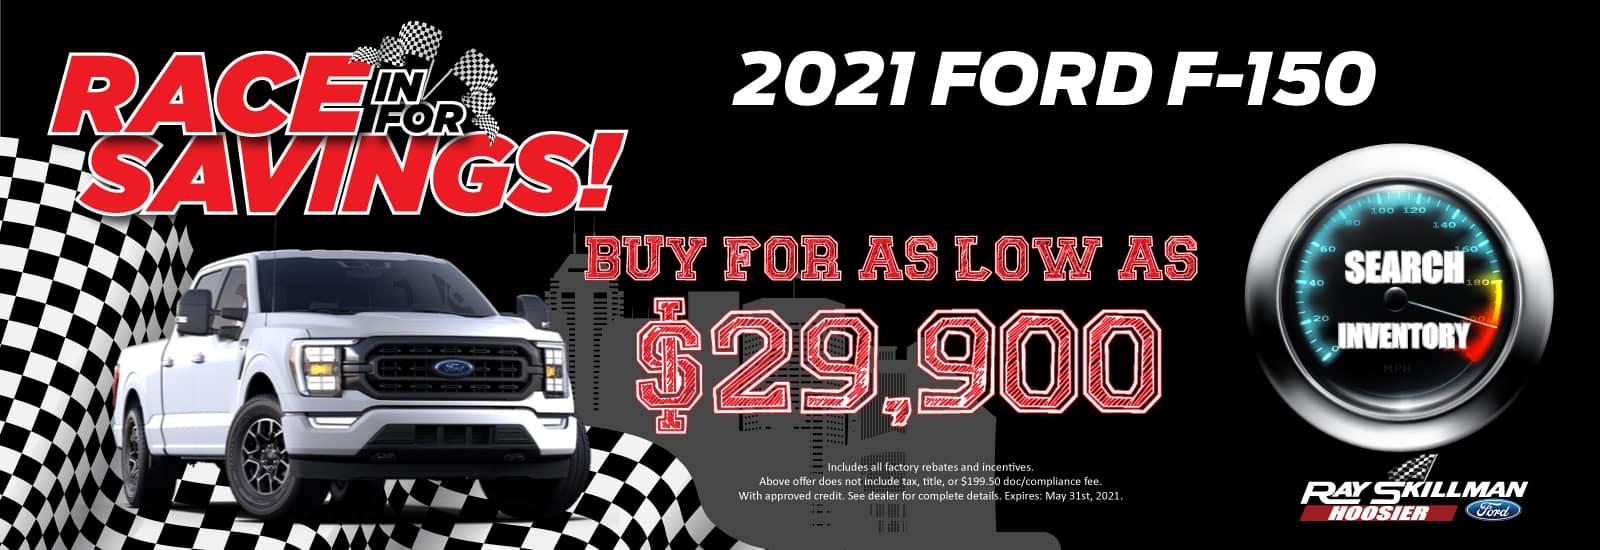 HOOSIERMAY2021-Ford-F-150-Web-Banner-1600×550